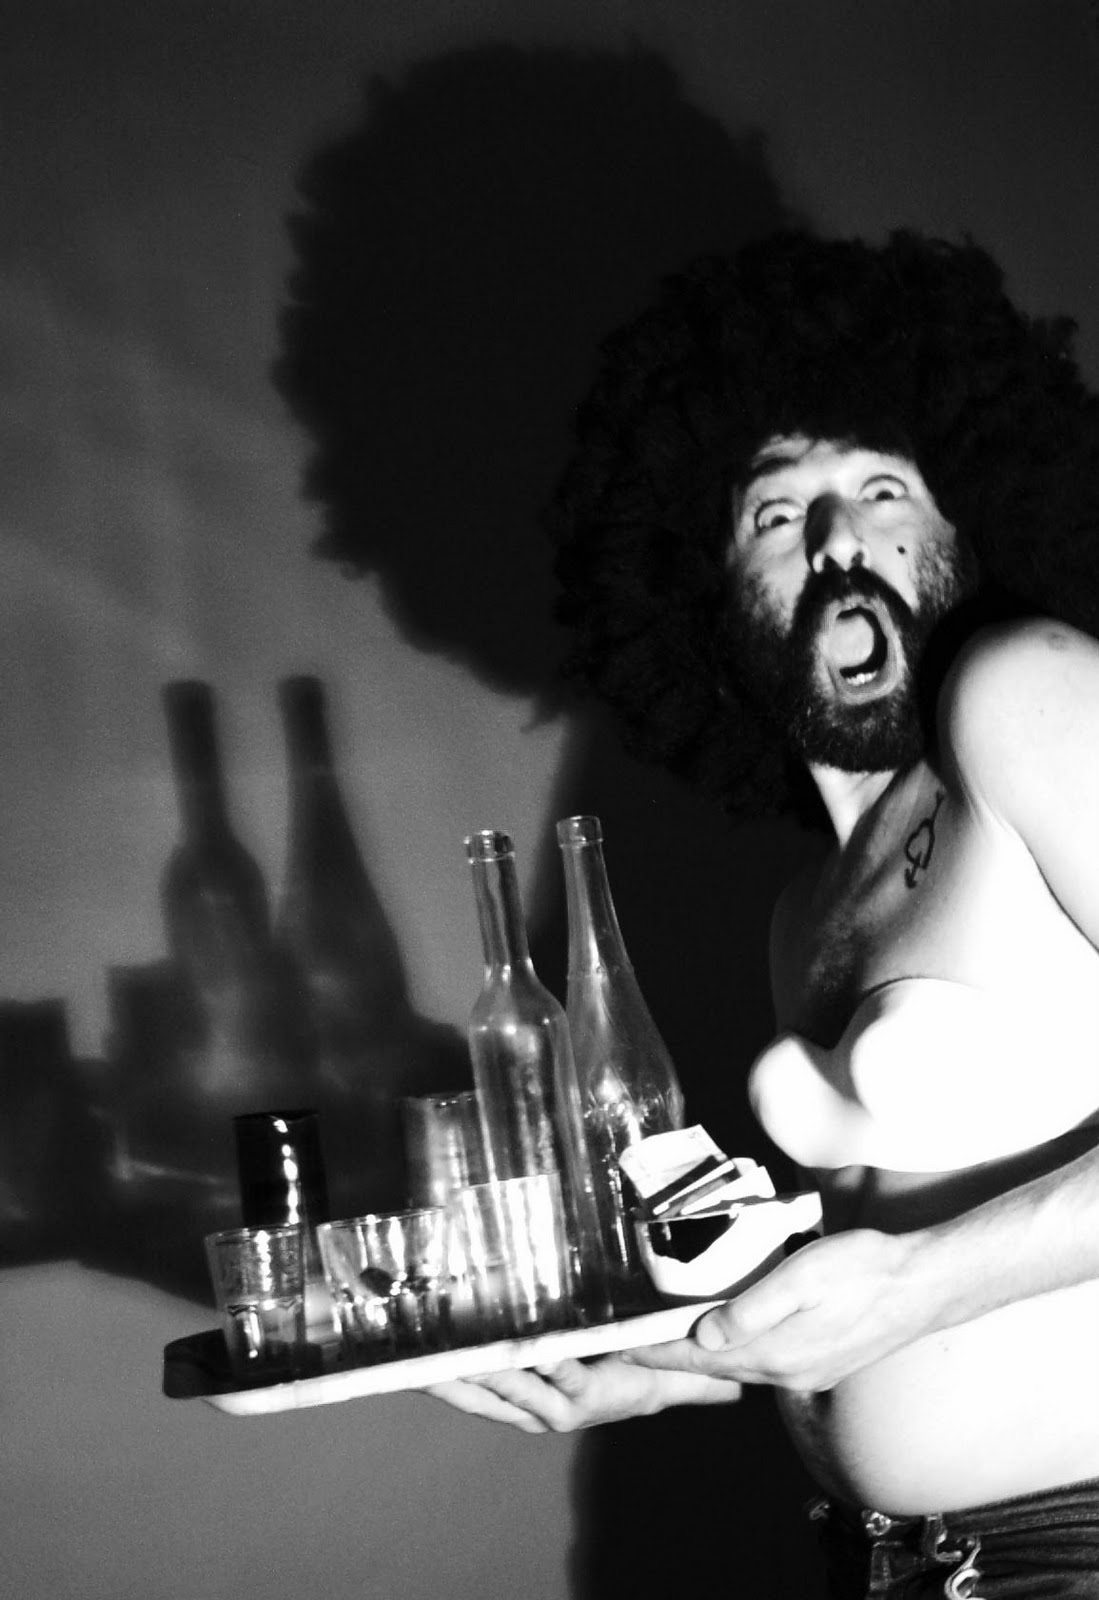 Bar De Putas daniel higiénico: una copa de champan en un bar de putas